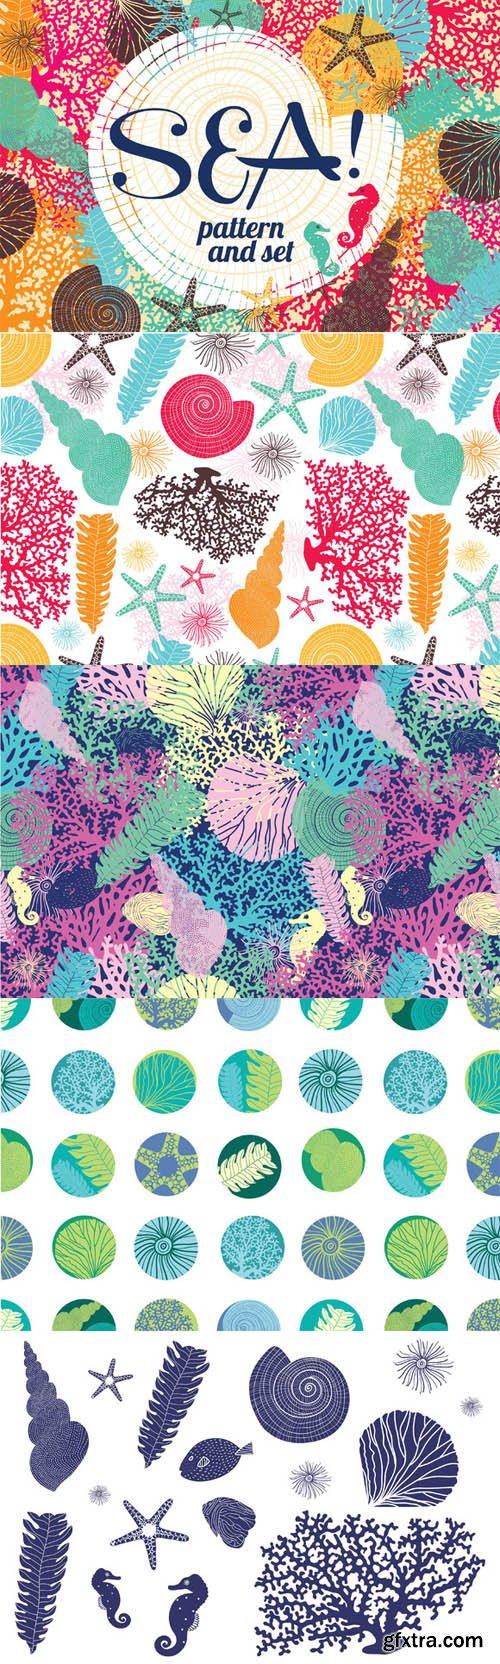 Sea Patterns - CM 288447